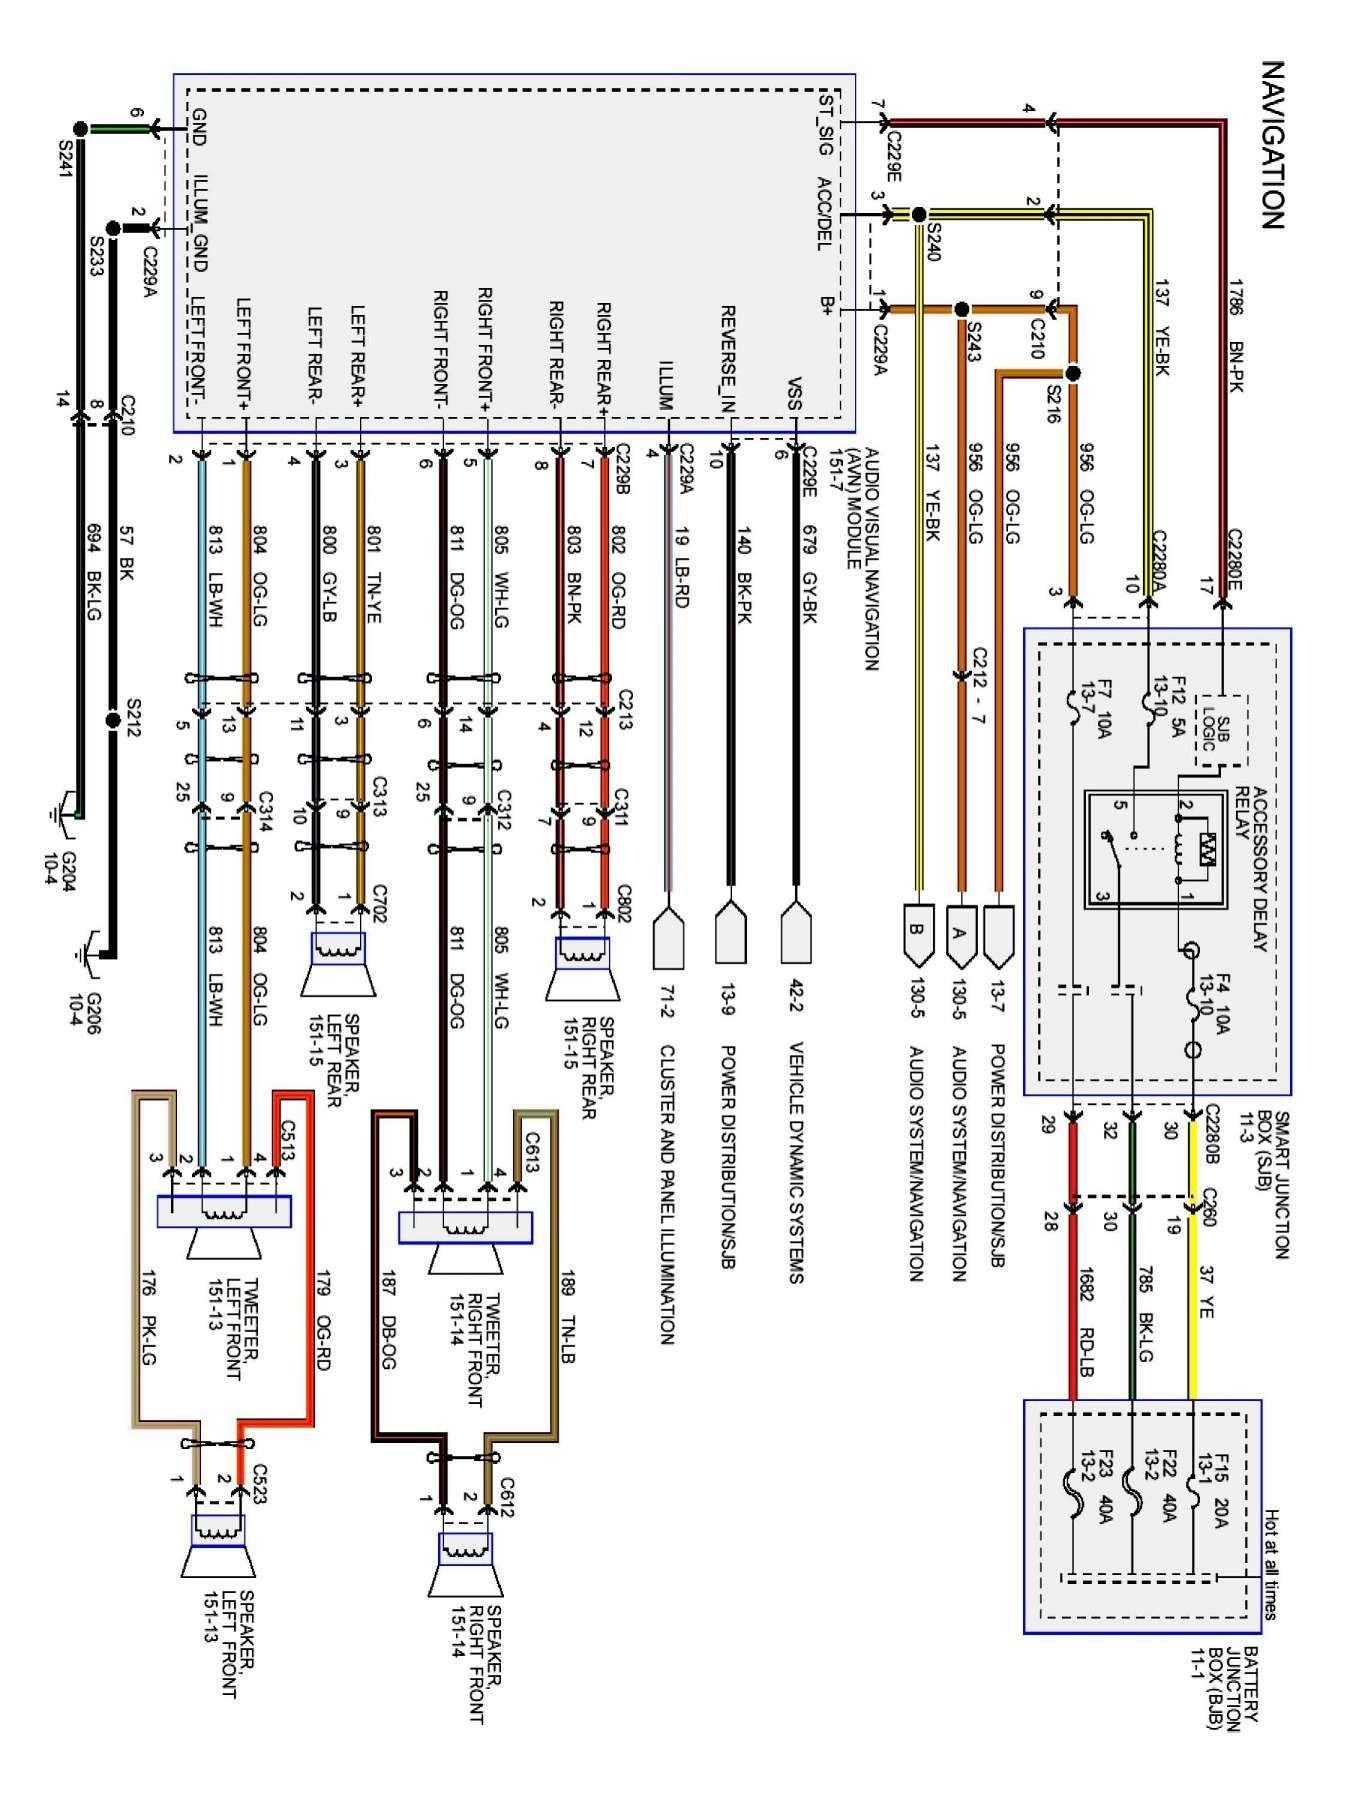 Jvc Kd-sr60 Wiring Diagram 918 Best Wiring Diagram Images In 2020